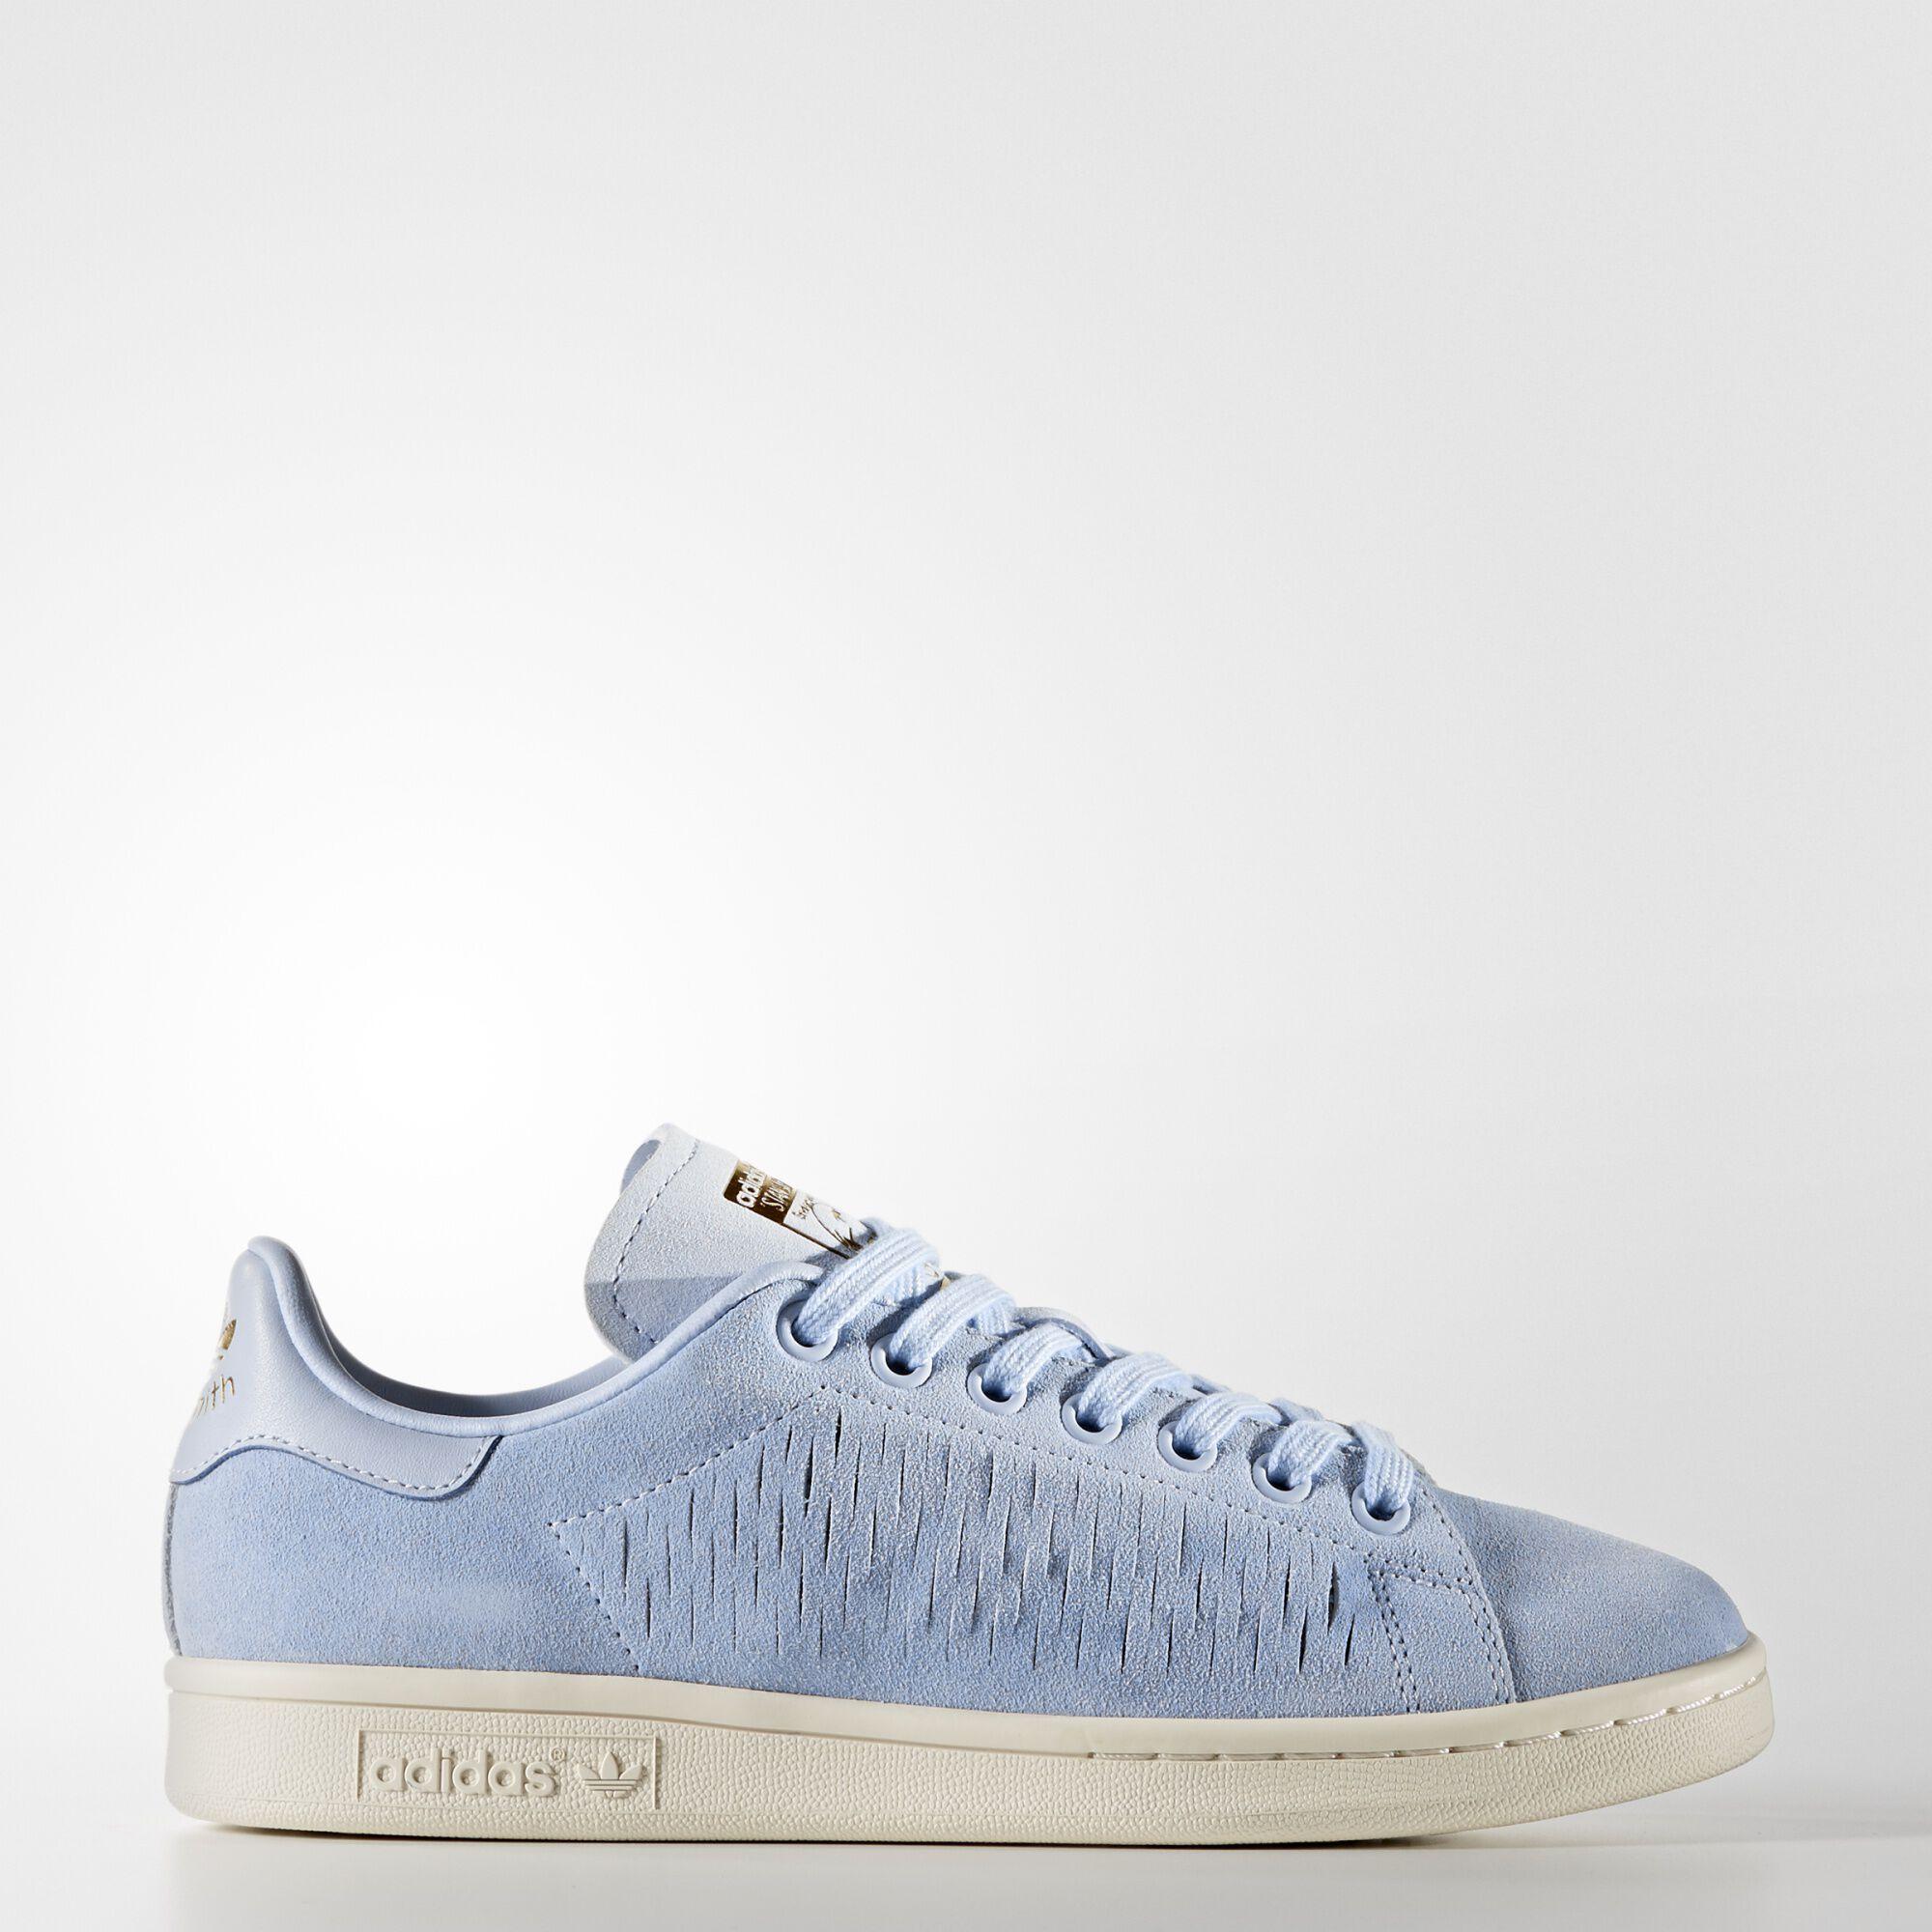 Adidas Stan Smith Blue Label